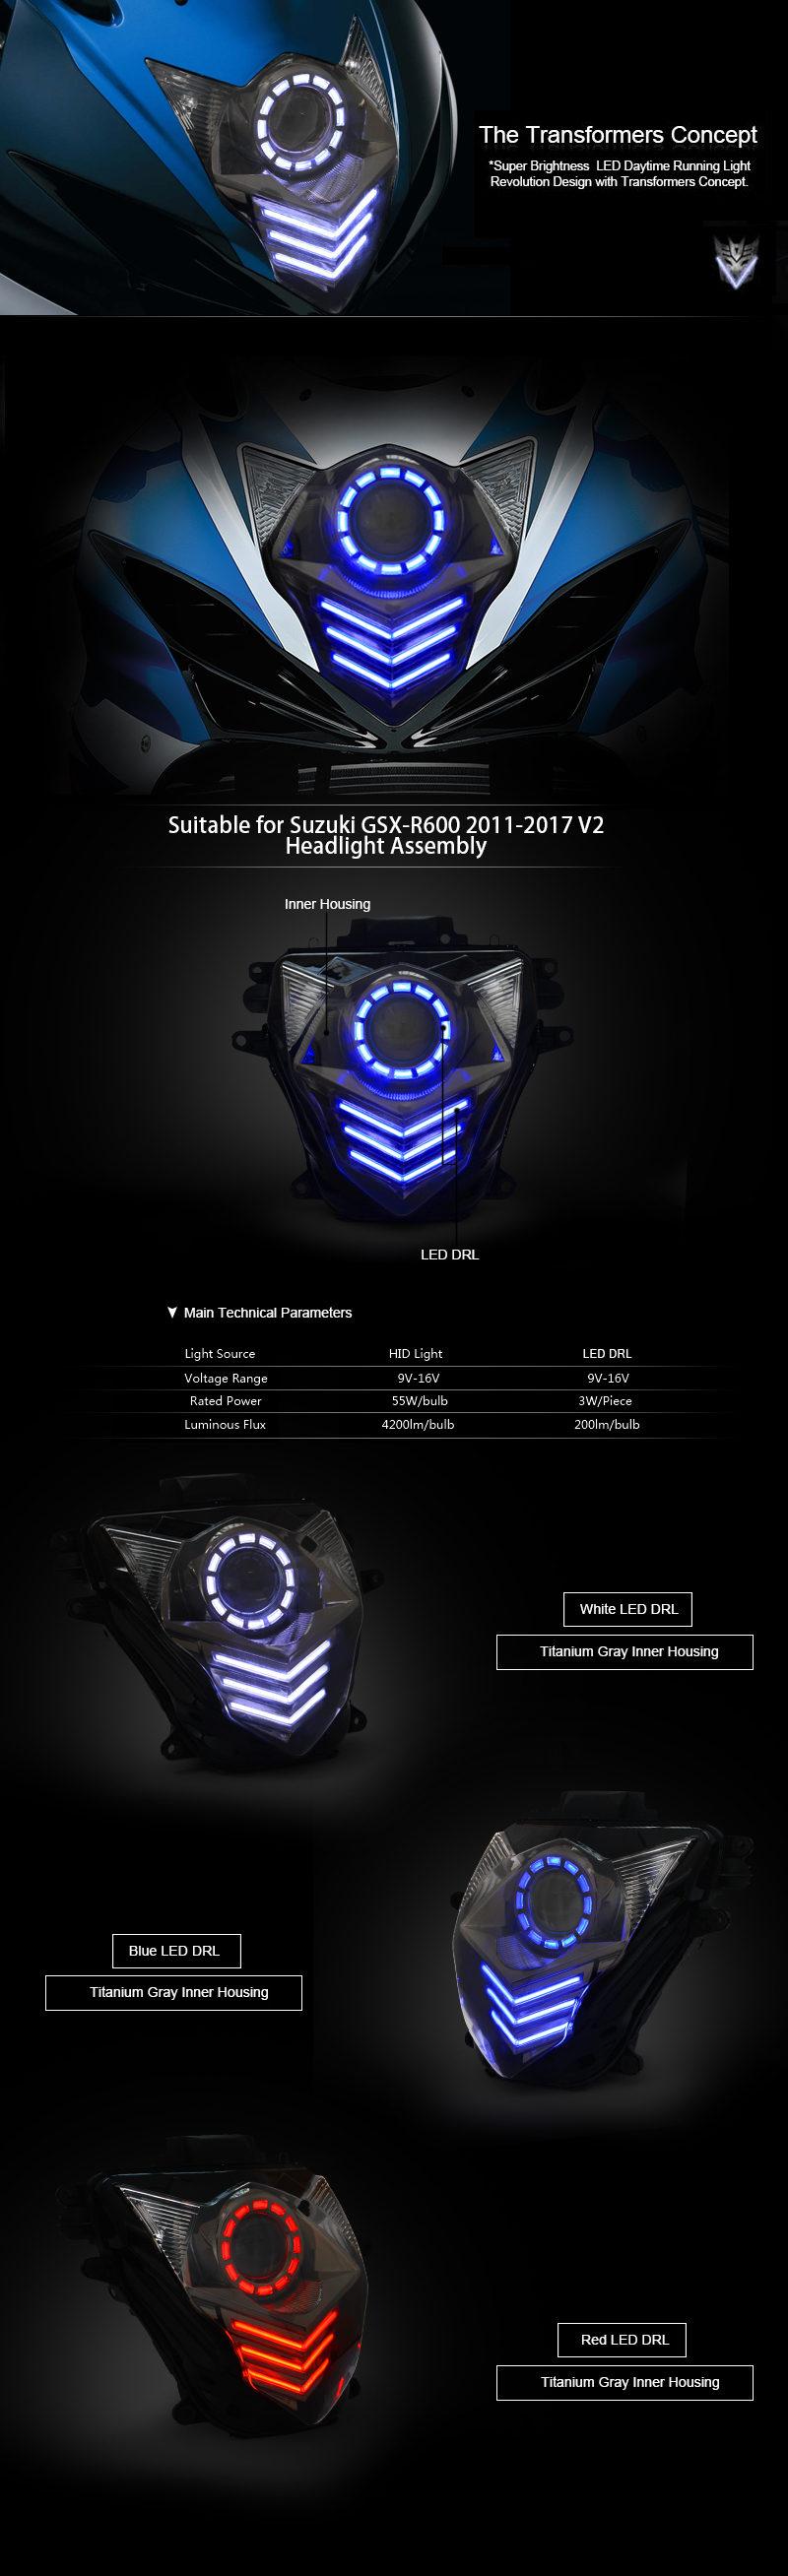 GSXR600 Headlight 2011 2012 2013 2014 2015 2016 2017